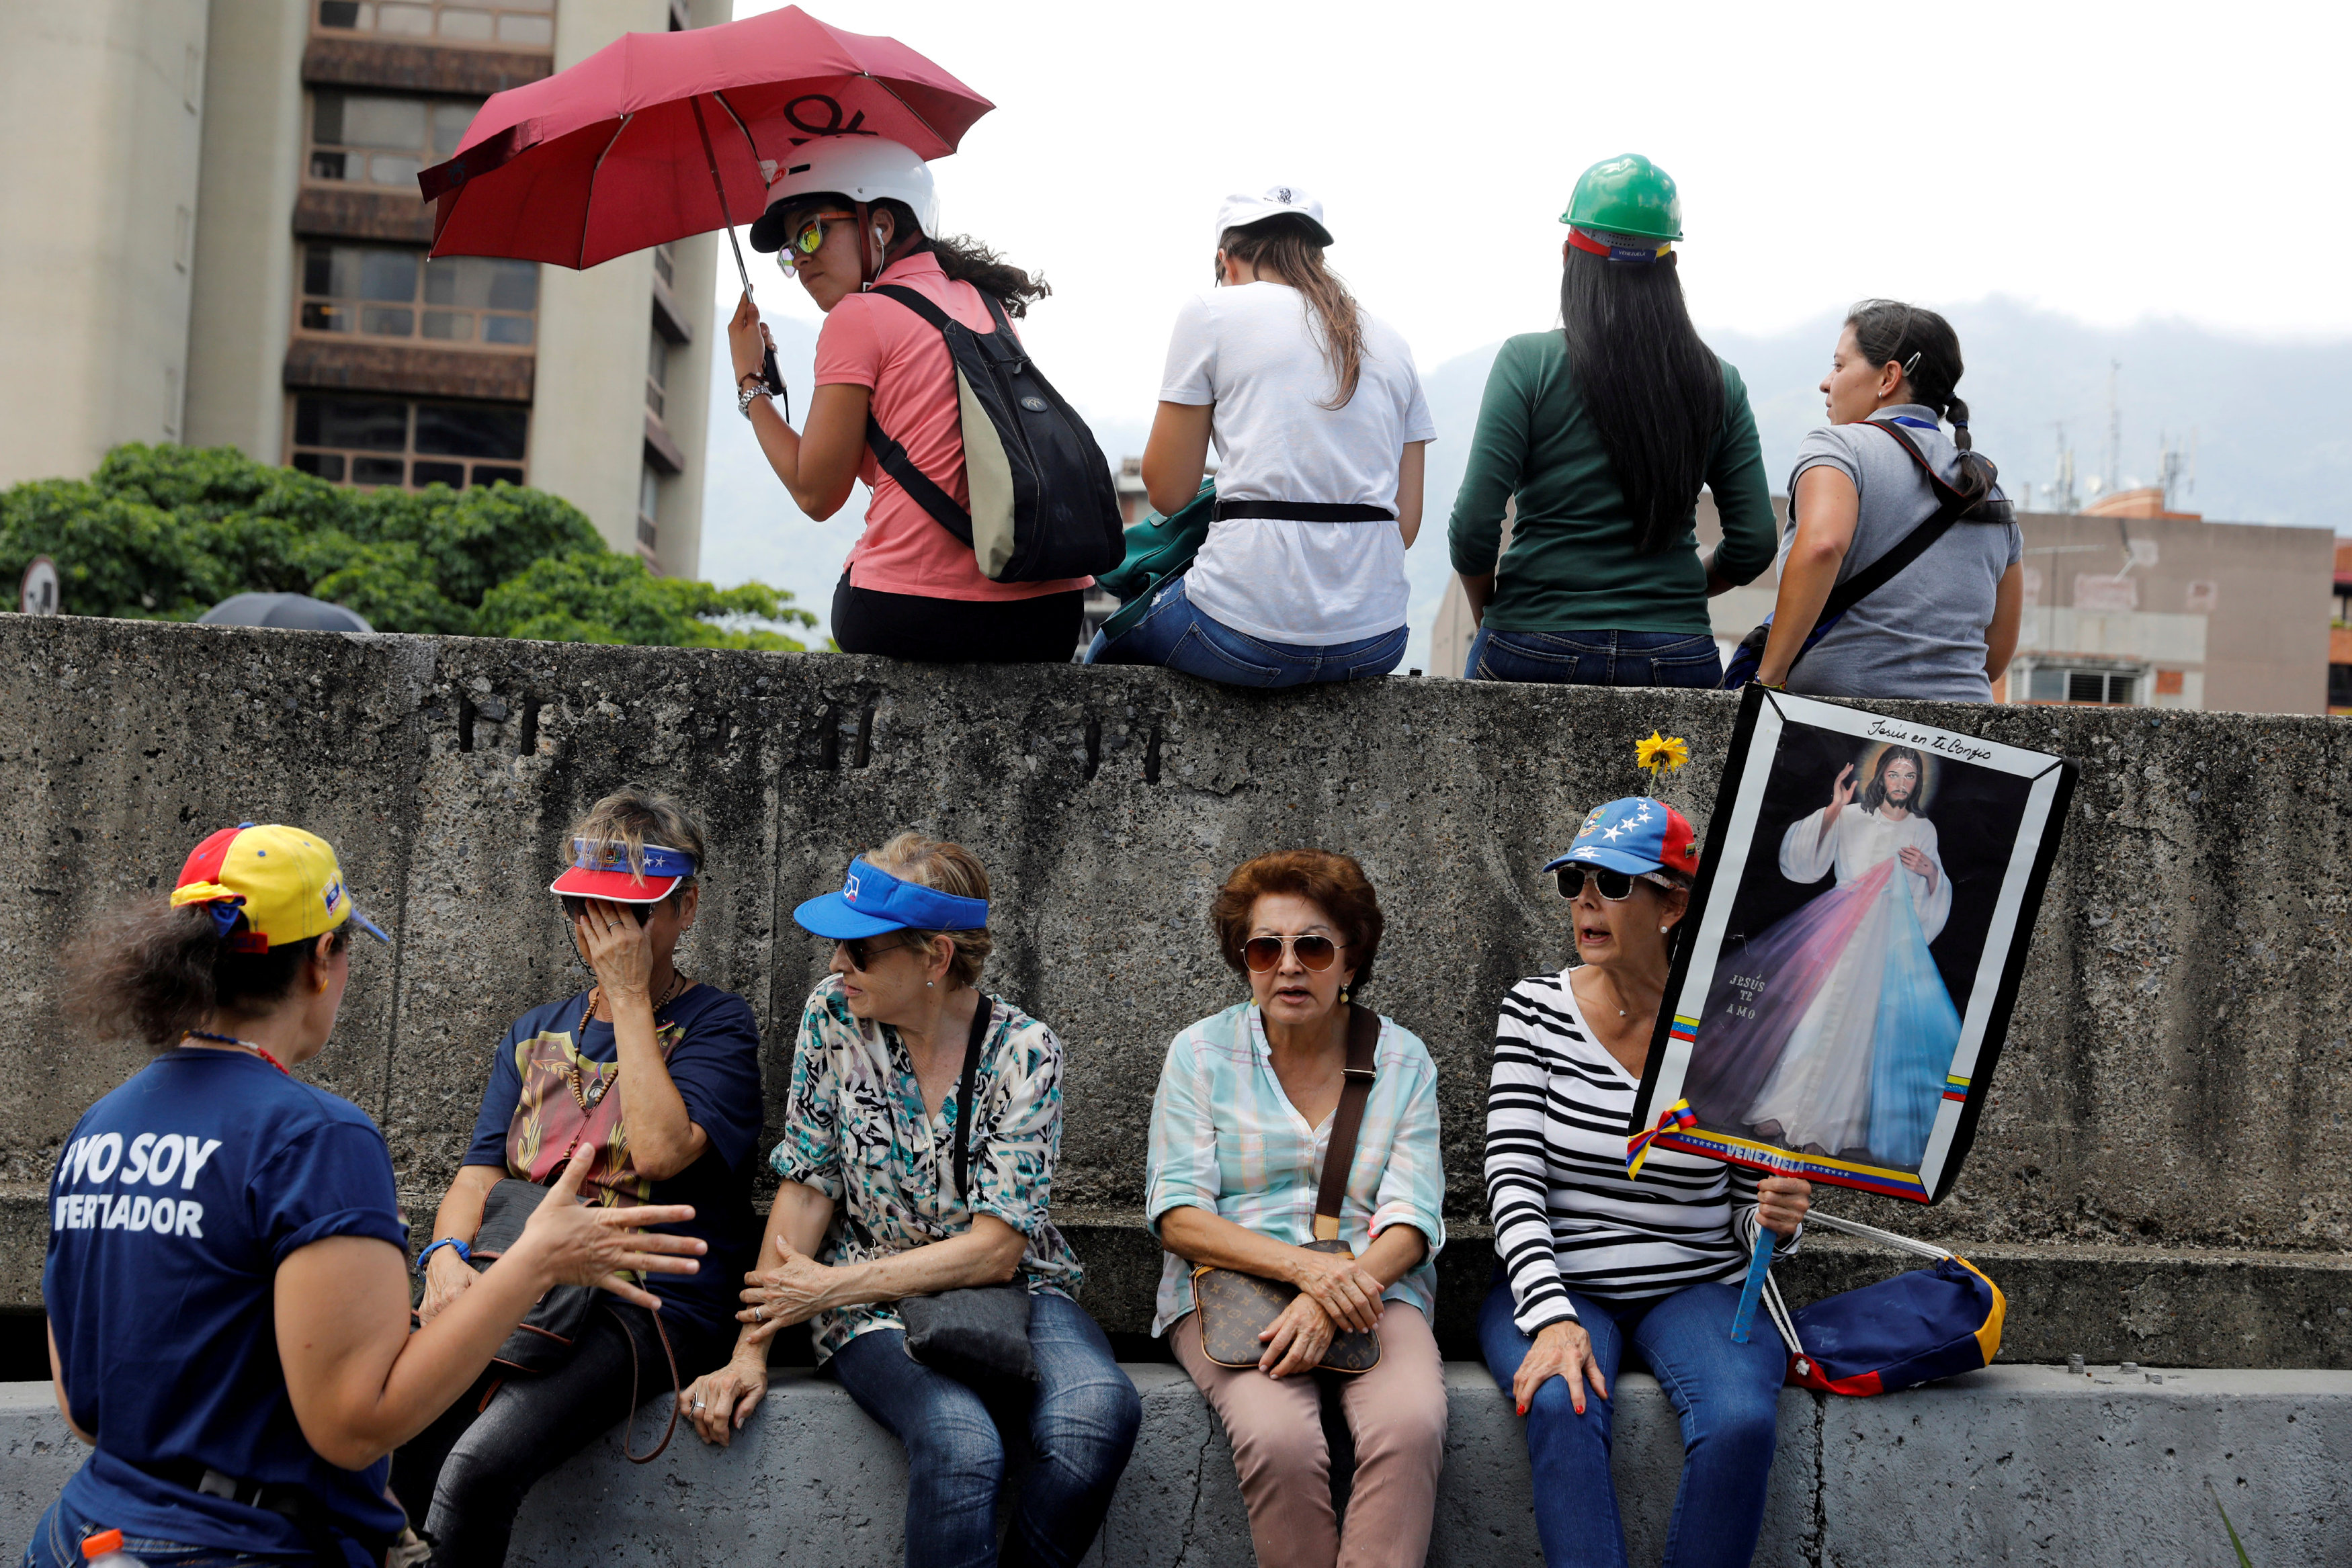 Caracas, Venezuela, July 6, 2017. REUTERS/Andres Martinez Casares